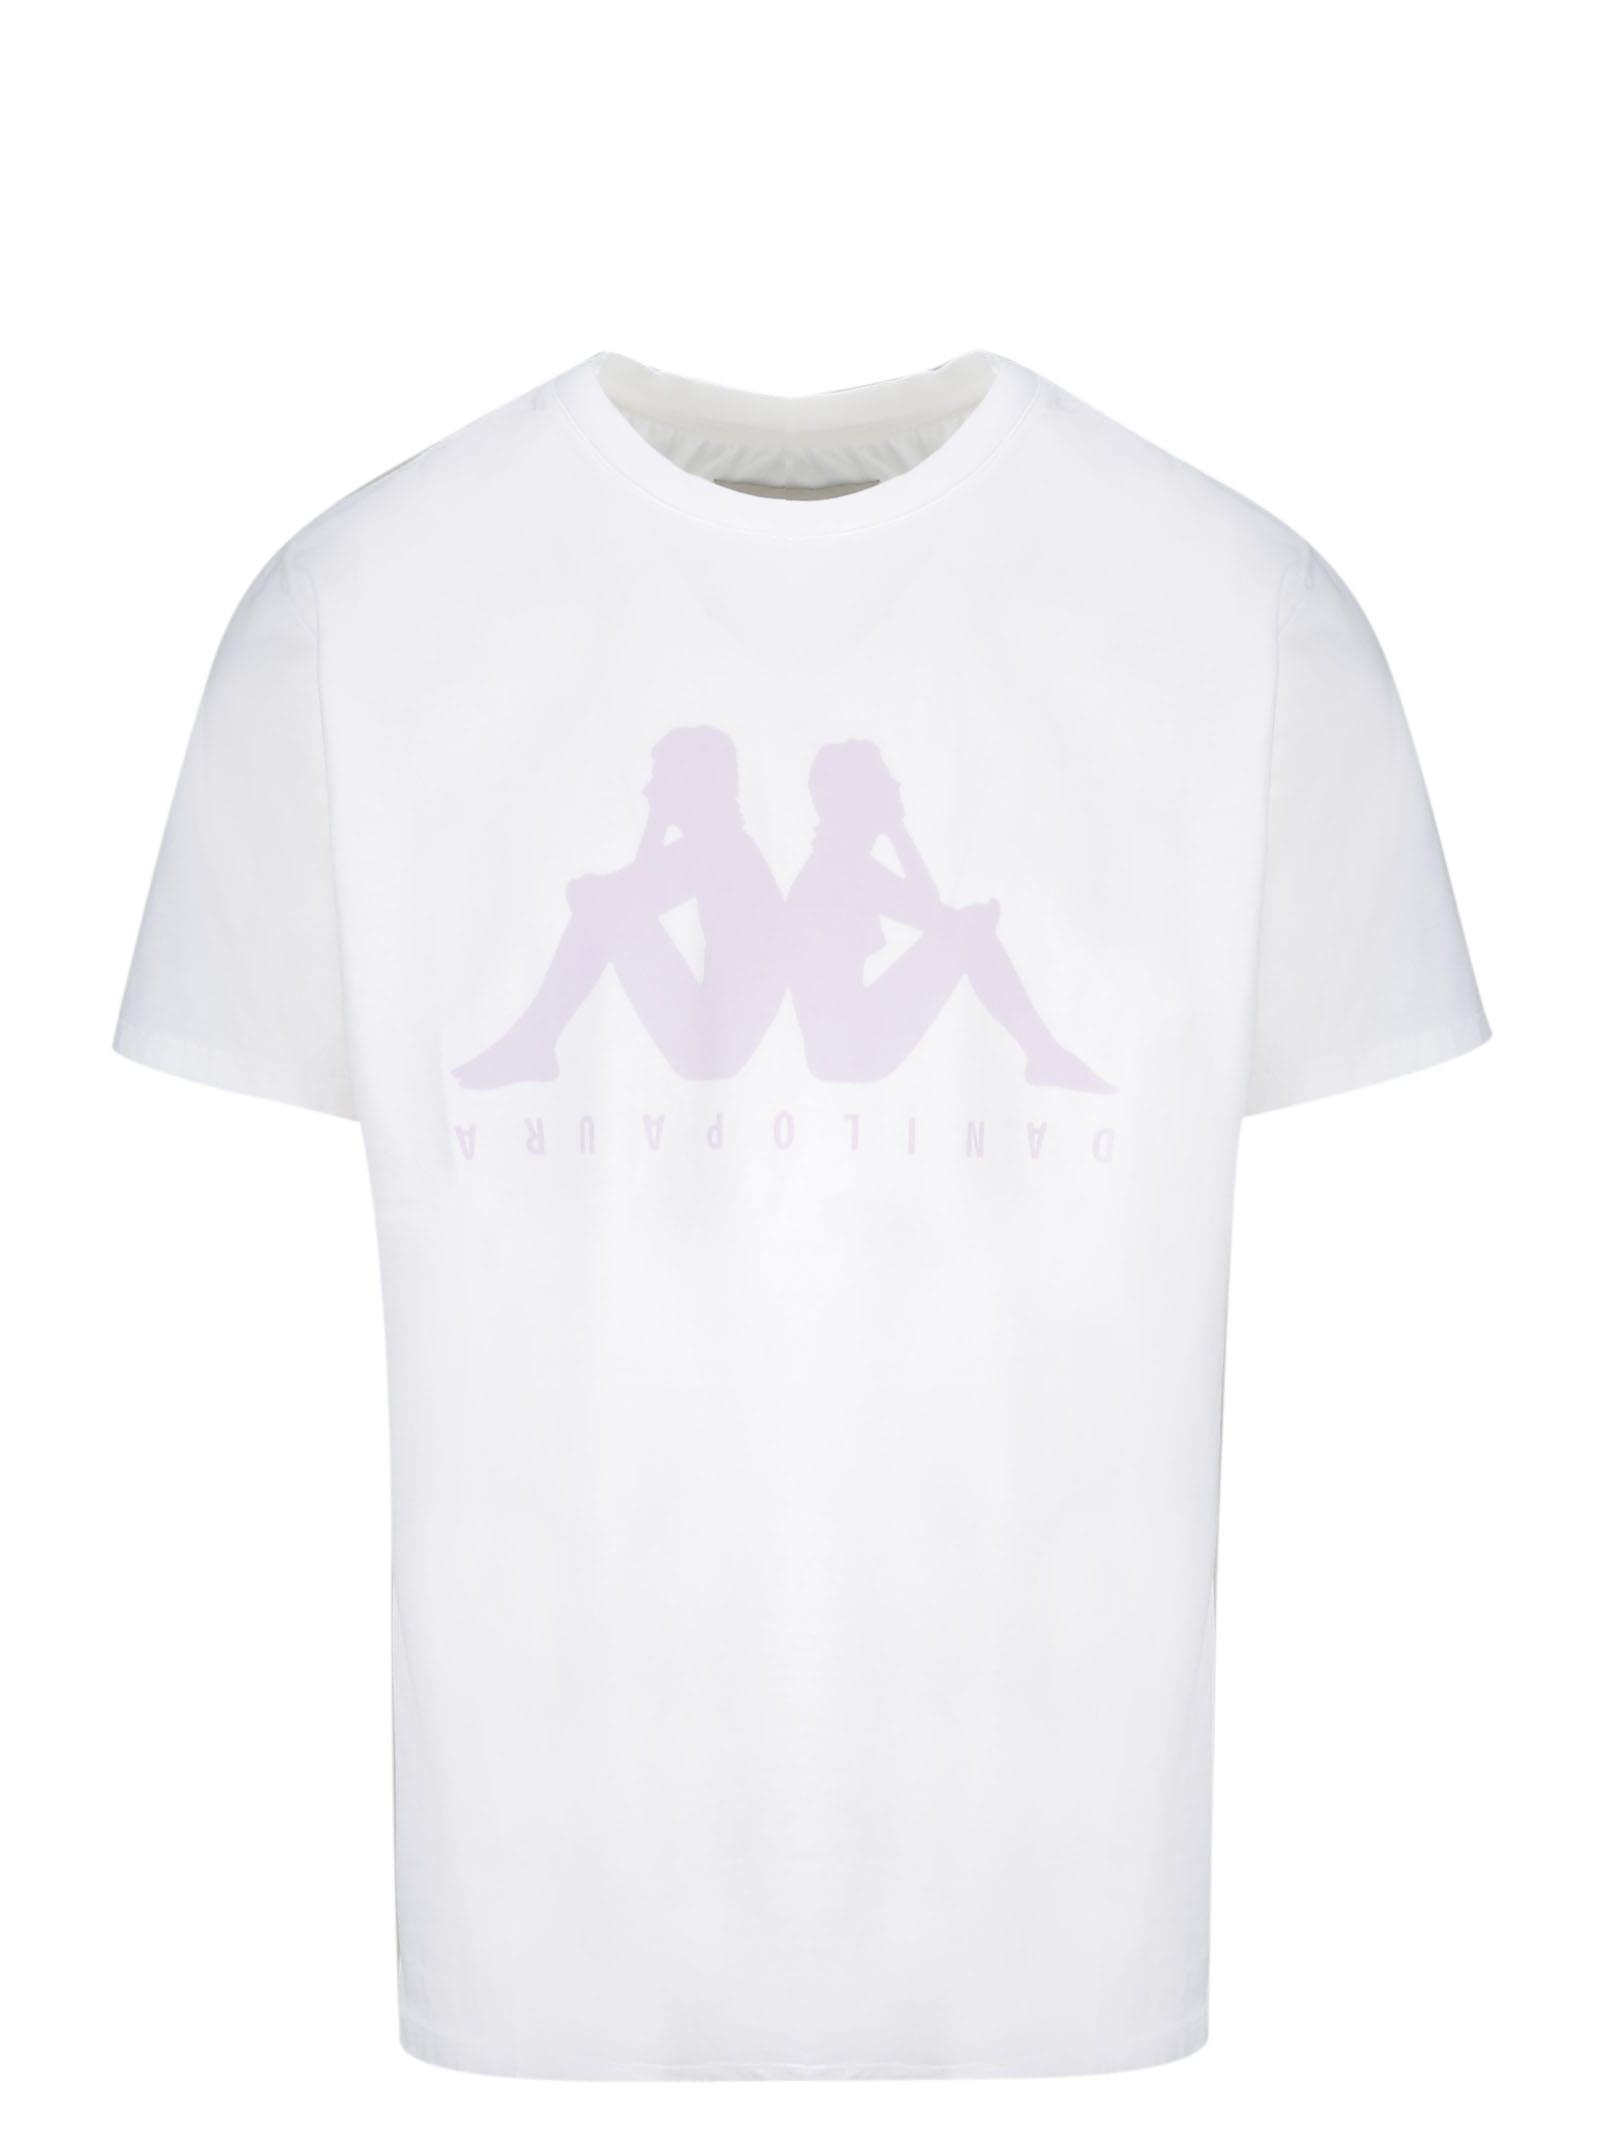 kappa shirt price